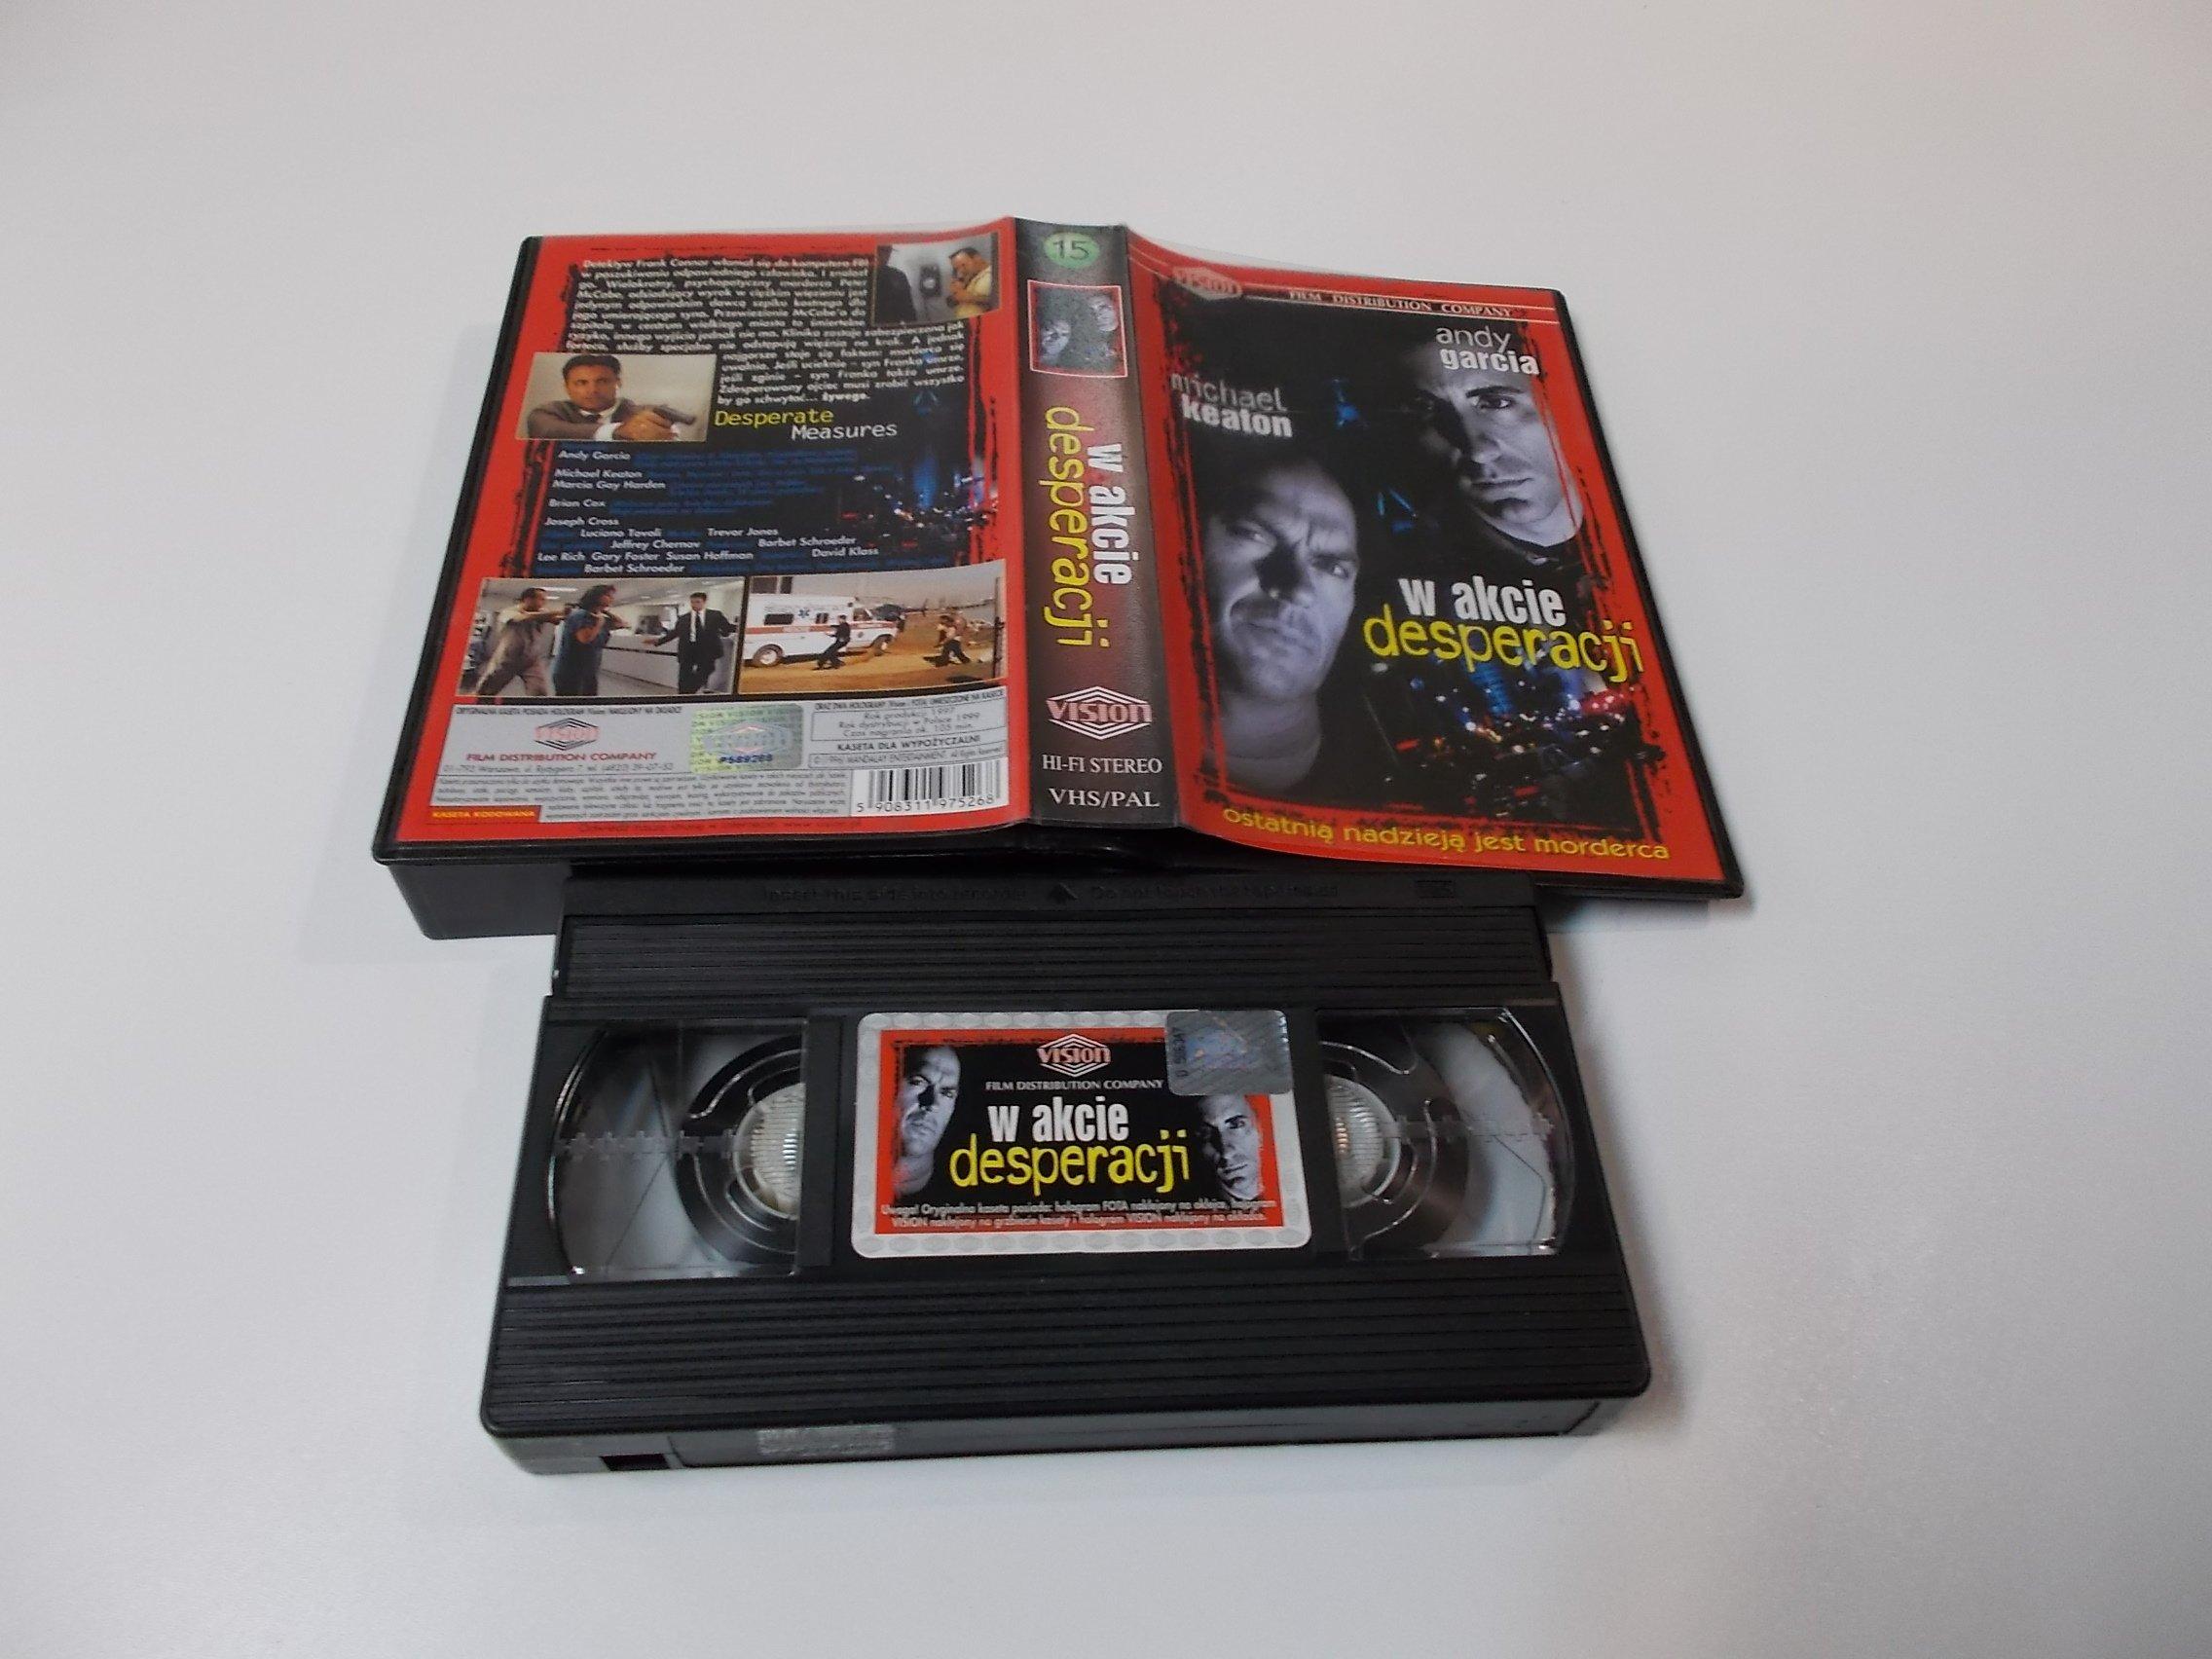 W AKCIE DESPERACJI - VHS Kaseta Video - Opole 1620